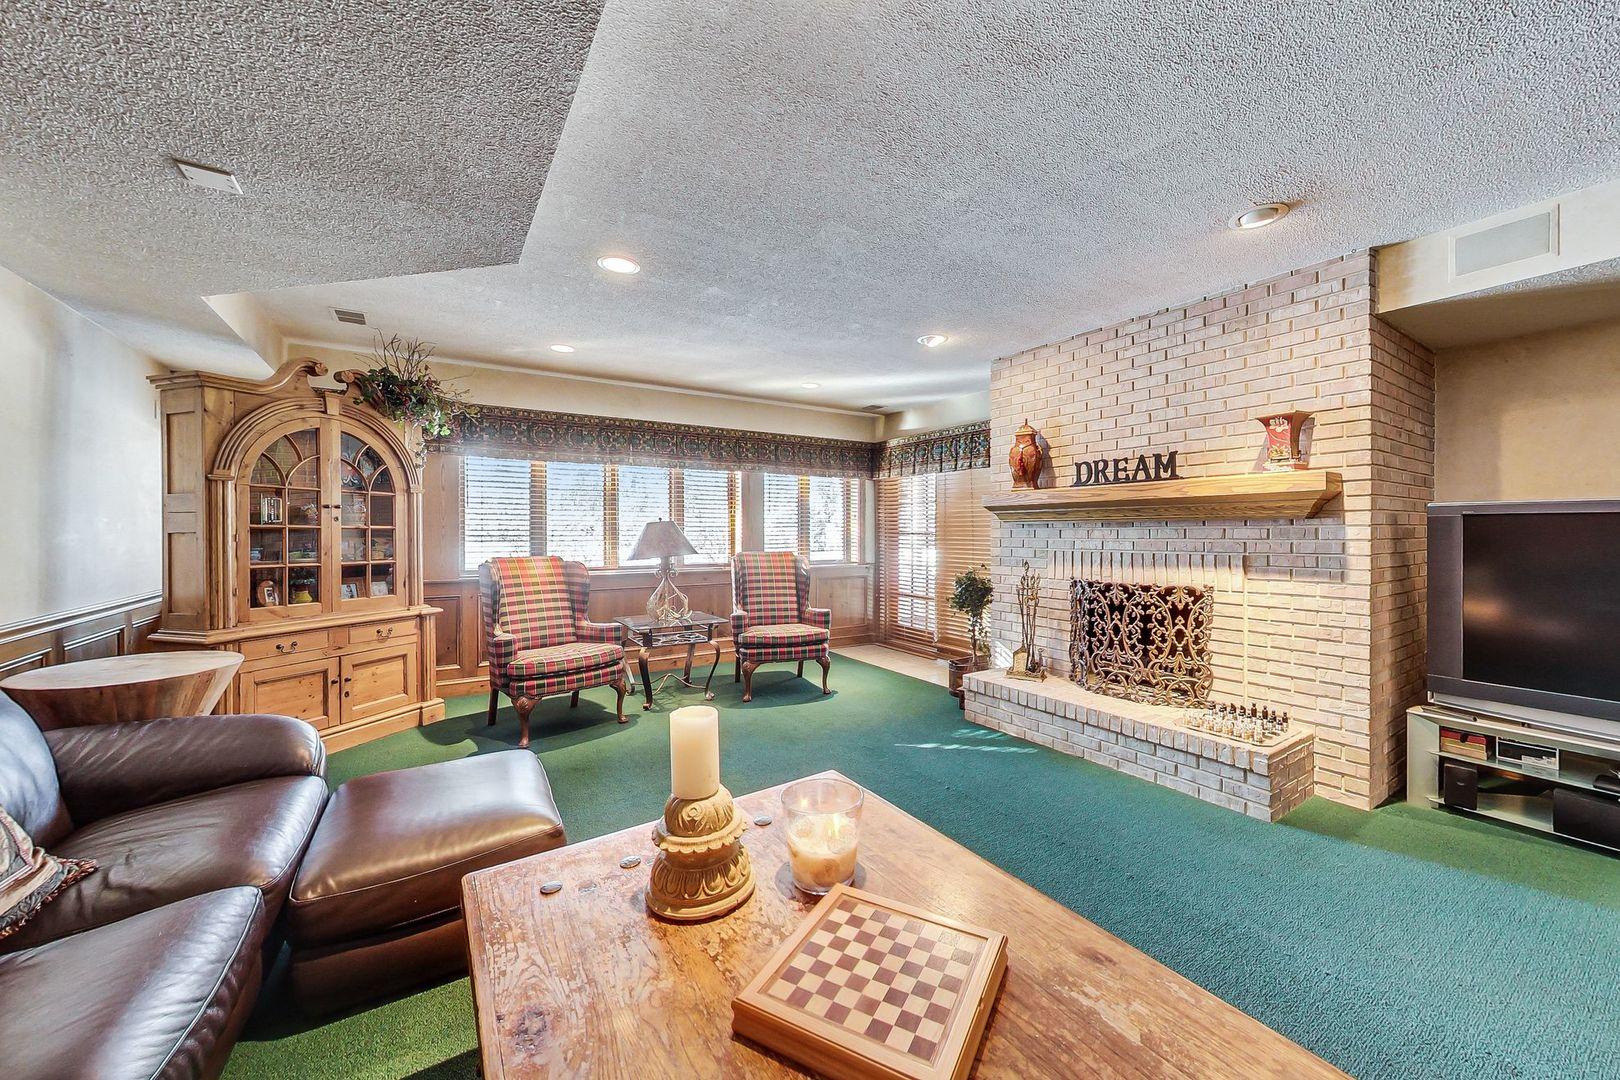 628 West Walnut, Hinsdale, Illinois, 60521